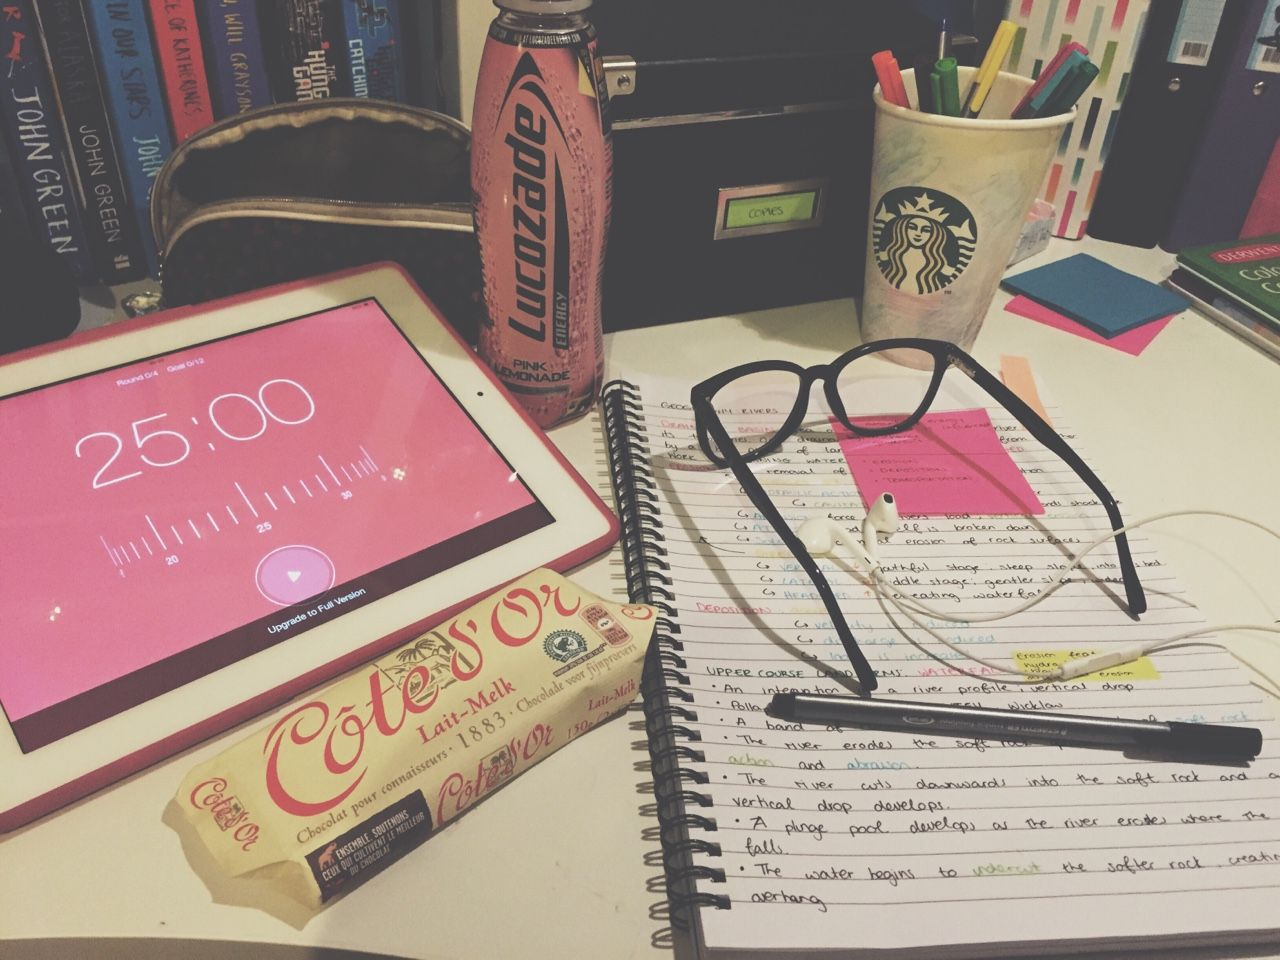 Late Night Study Essentials